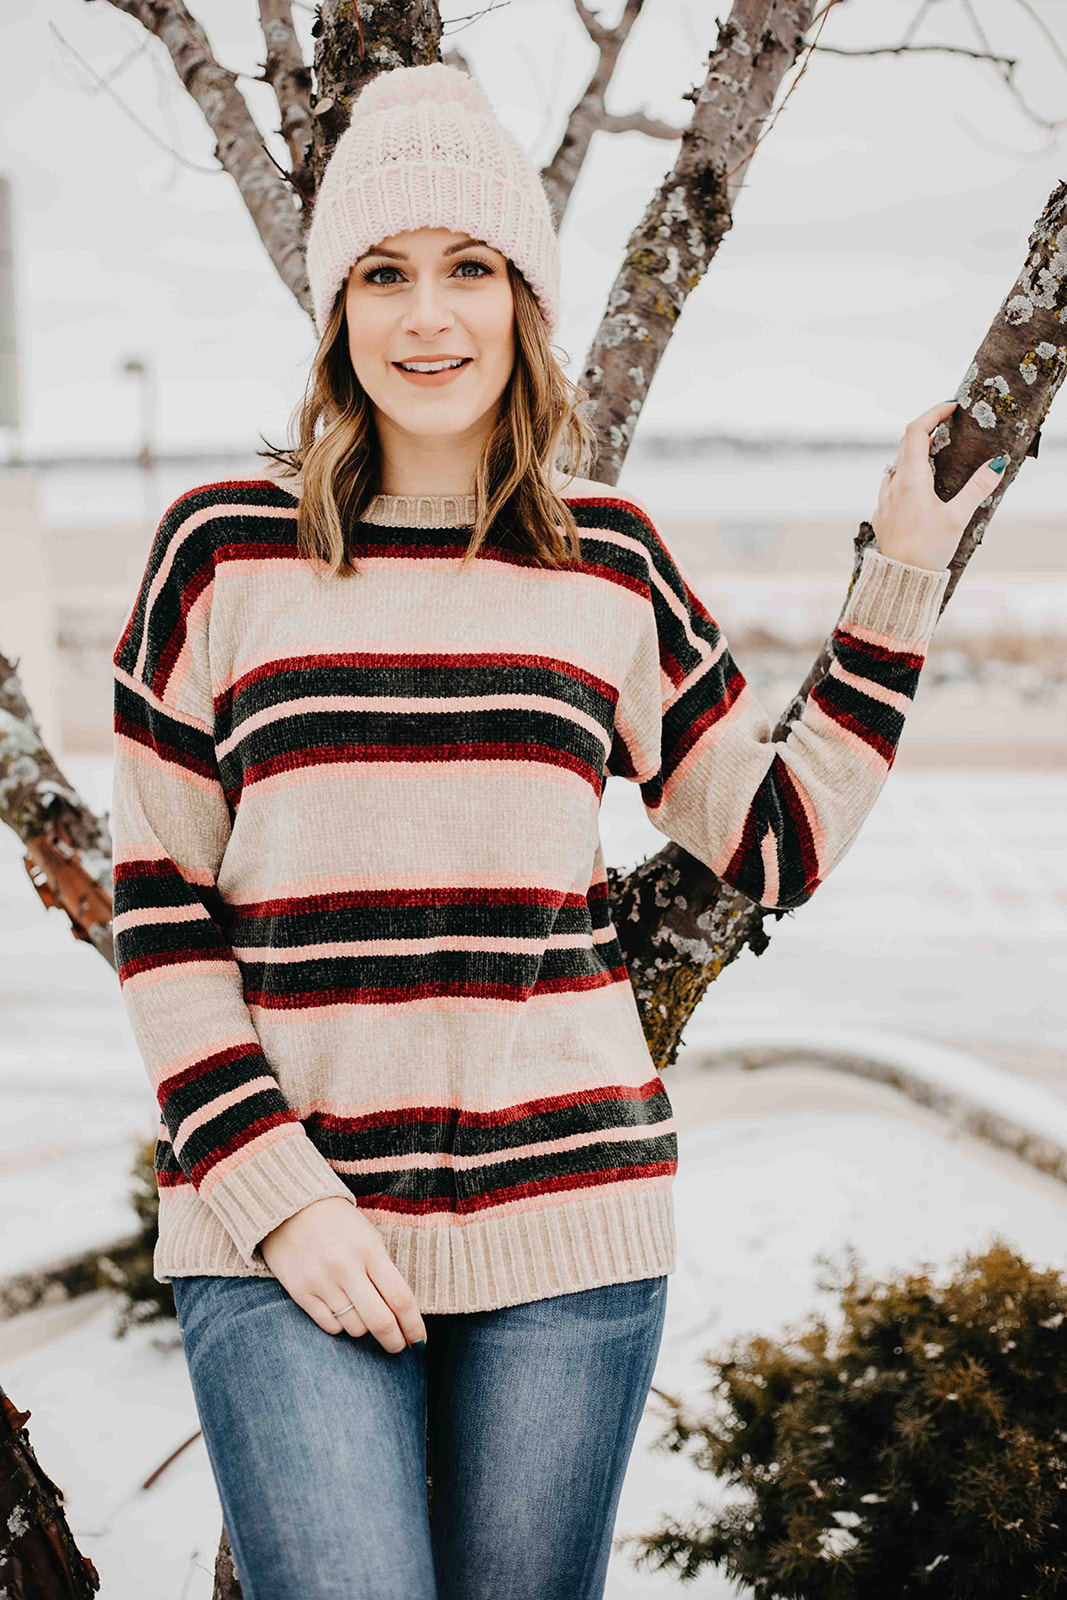 Winter Wearables // Pom Pom Beanies